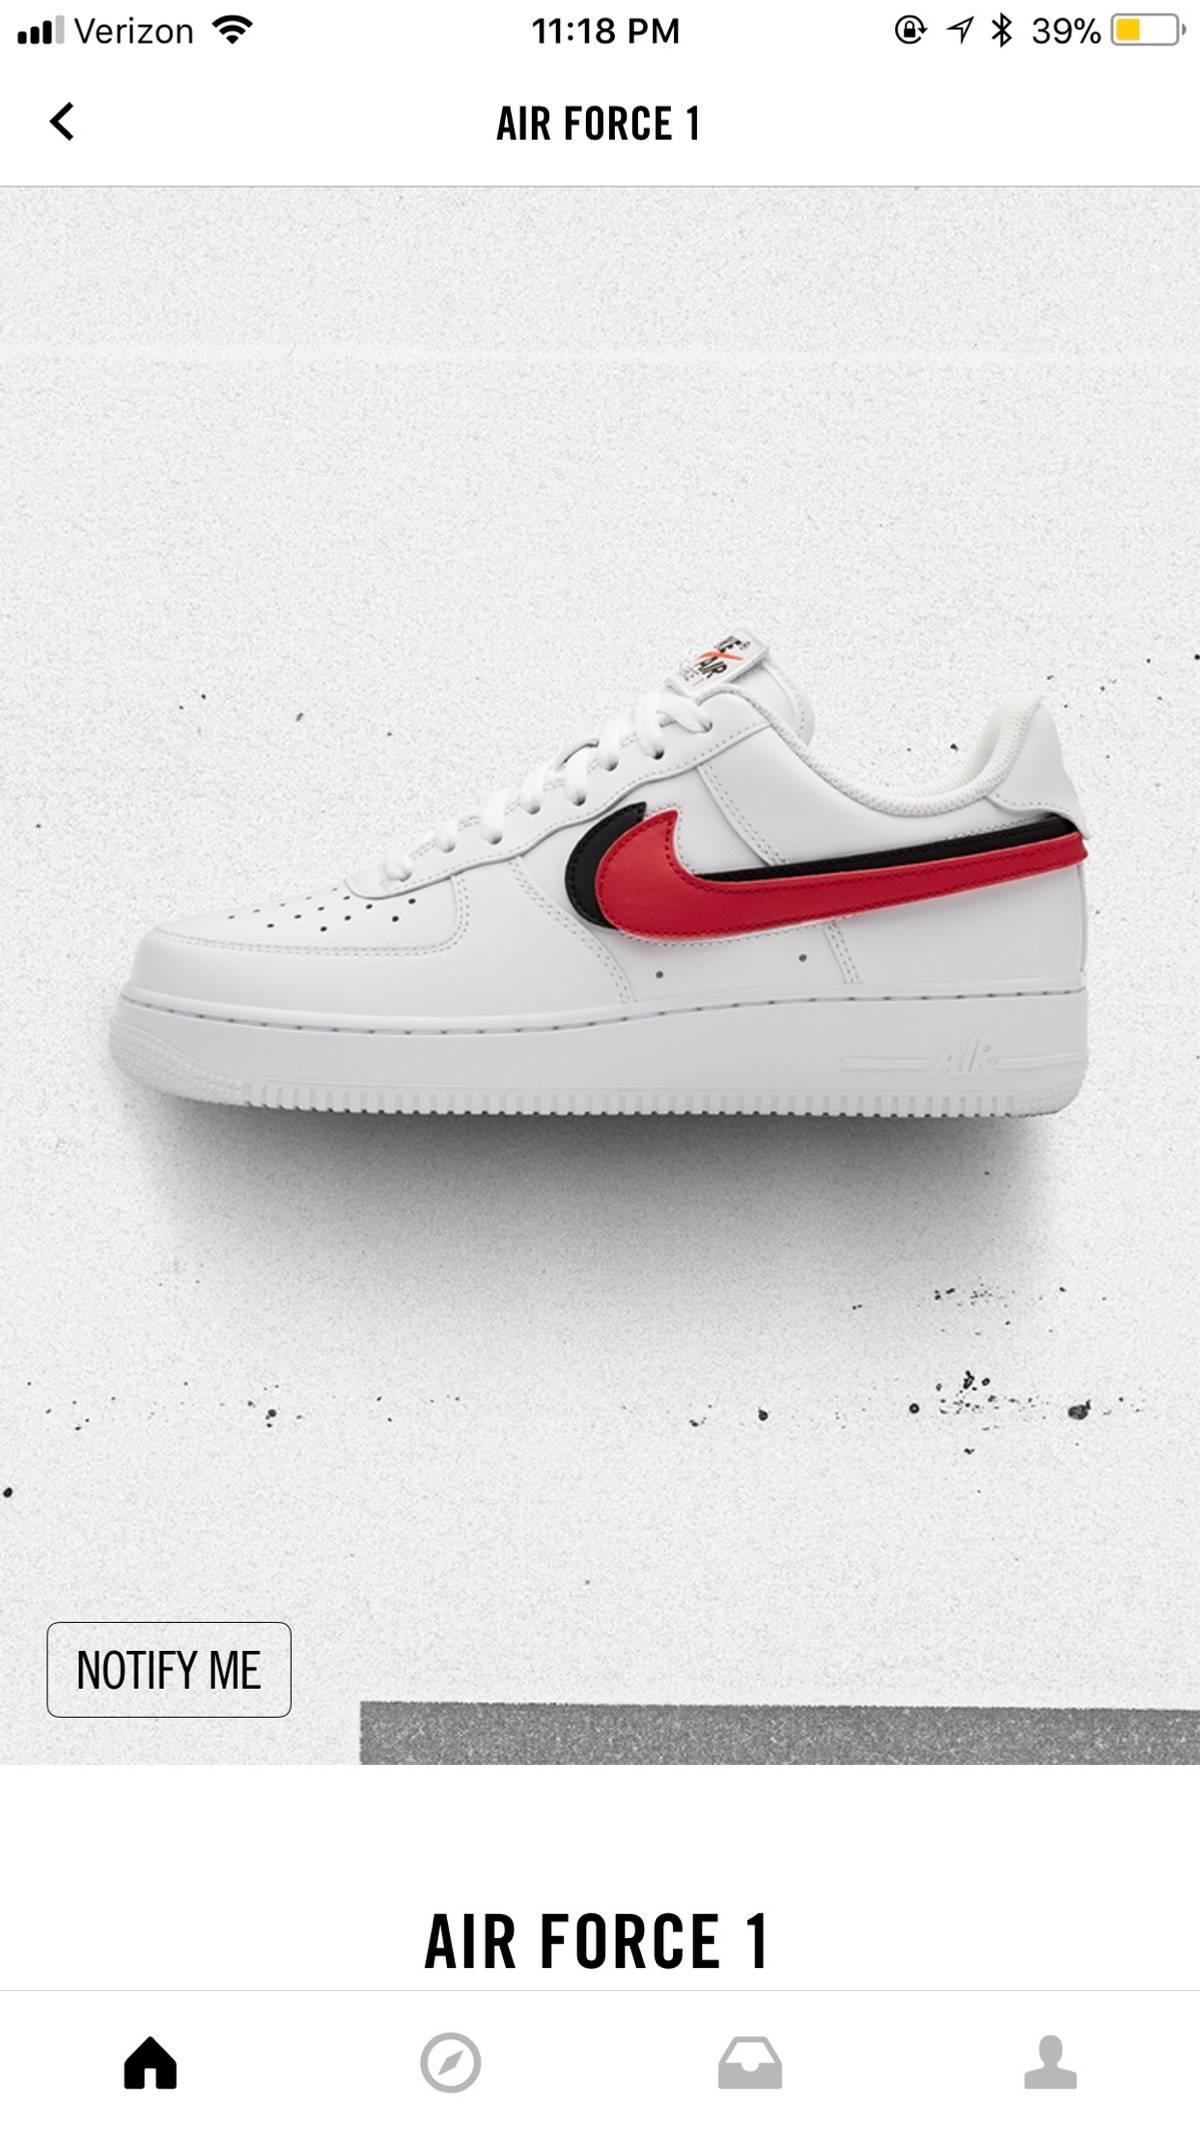 Force Air 1 Nike Air Nike Force 1 R54AjL